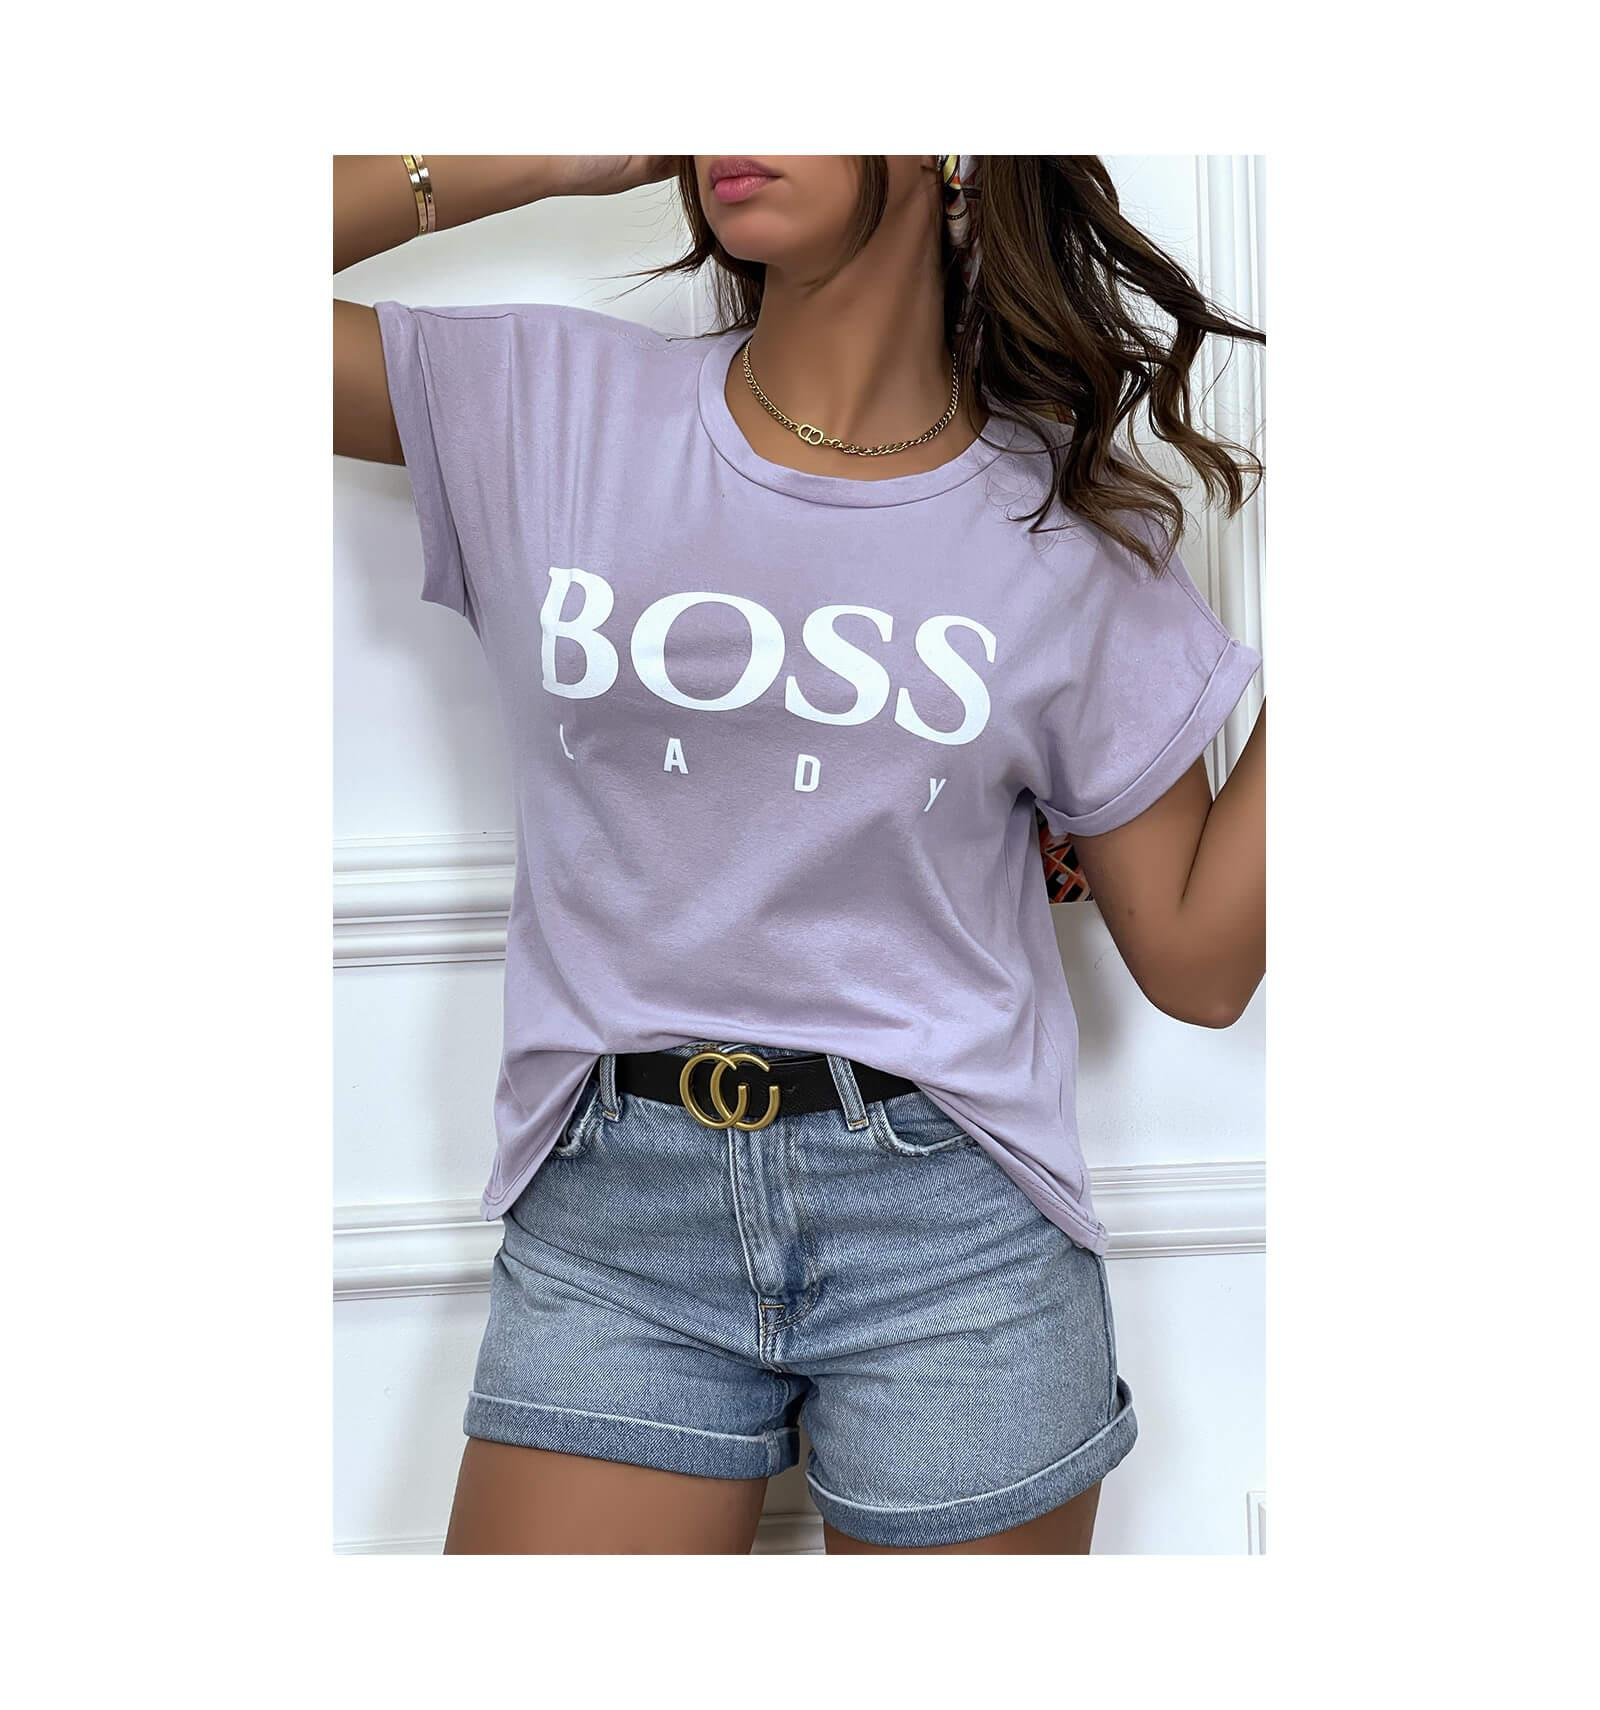 Tee shirt boss lady lilas 1 1